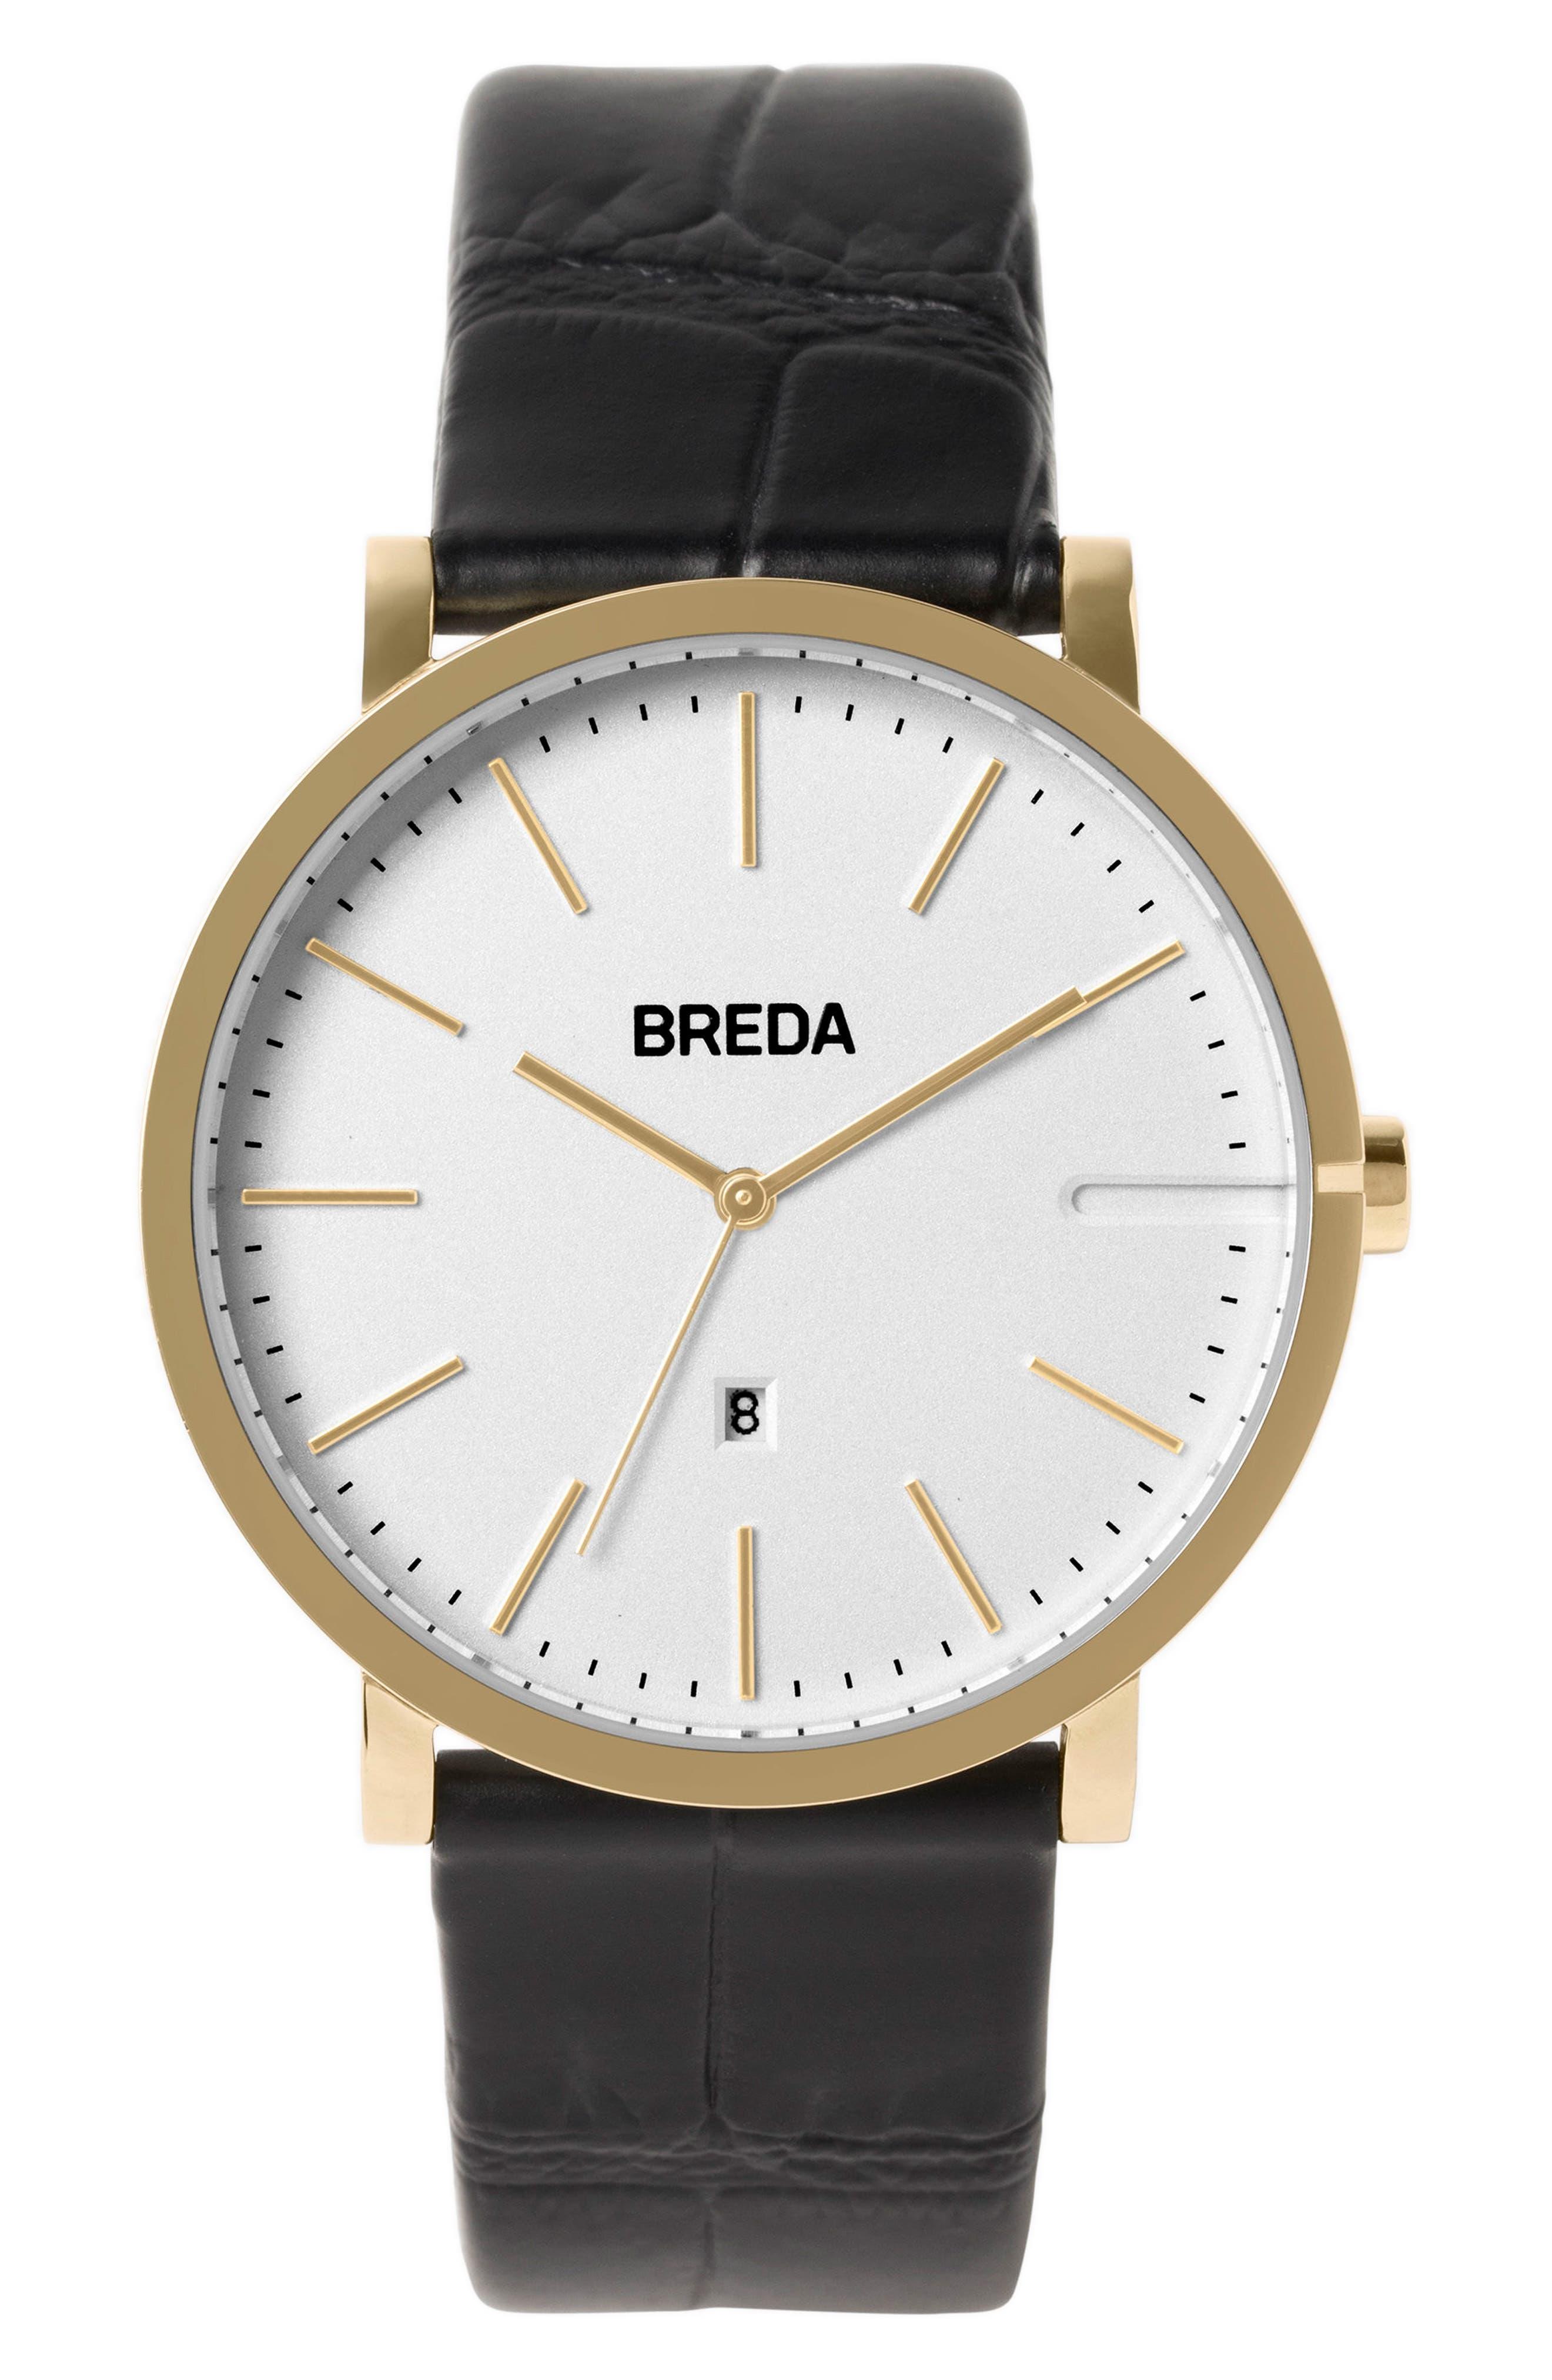 Main Image - BREDA Breuer Leather Strap Watch, 39mm